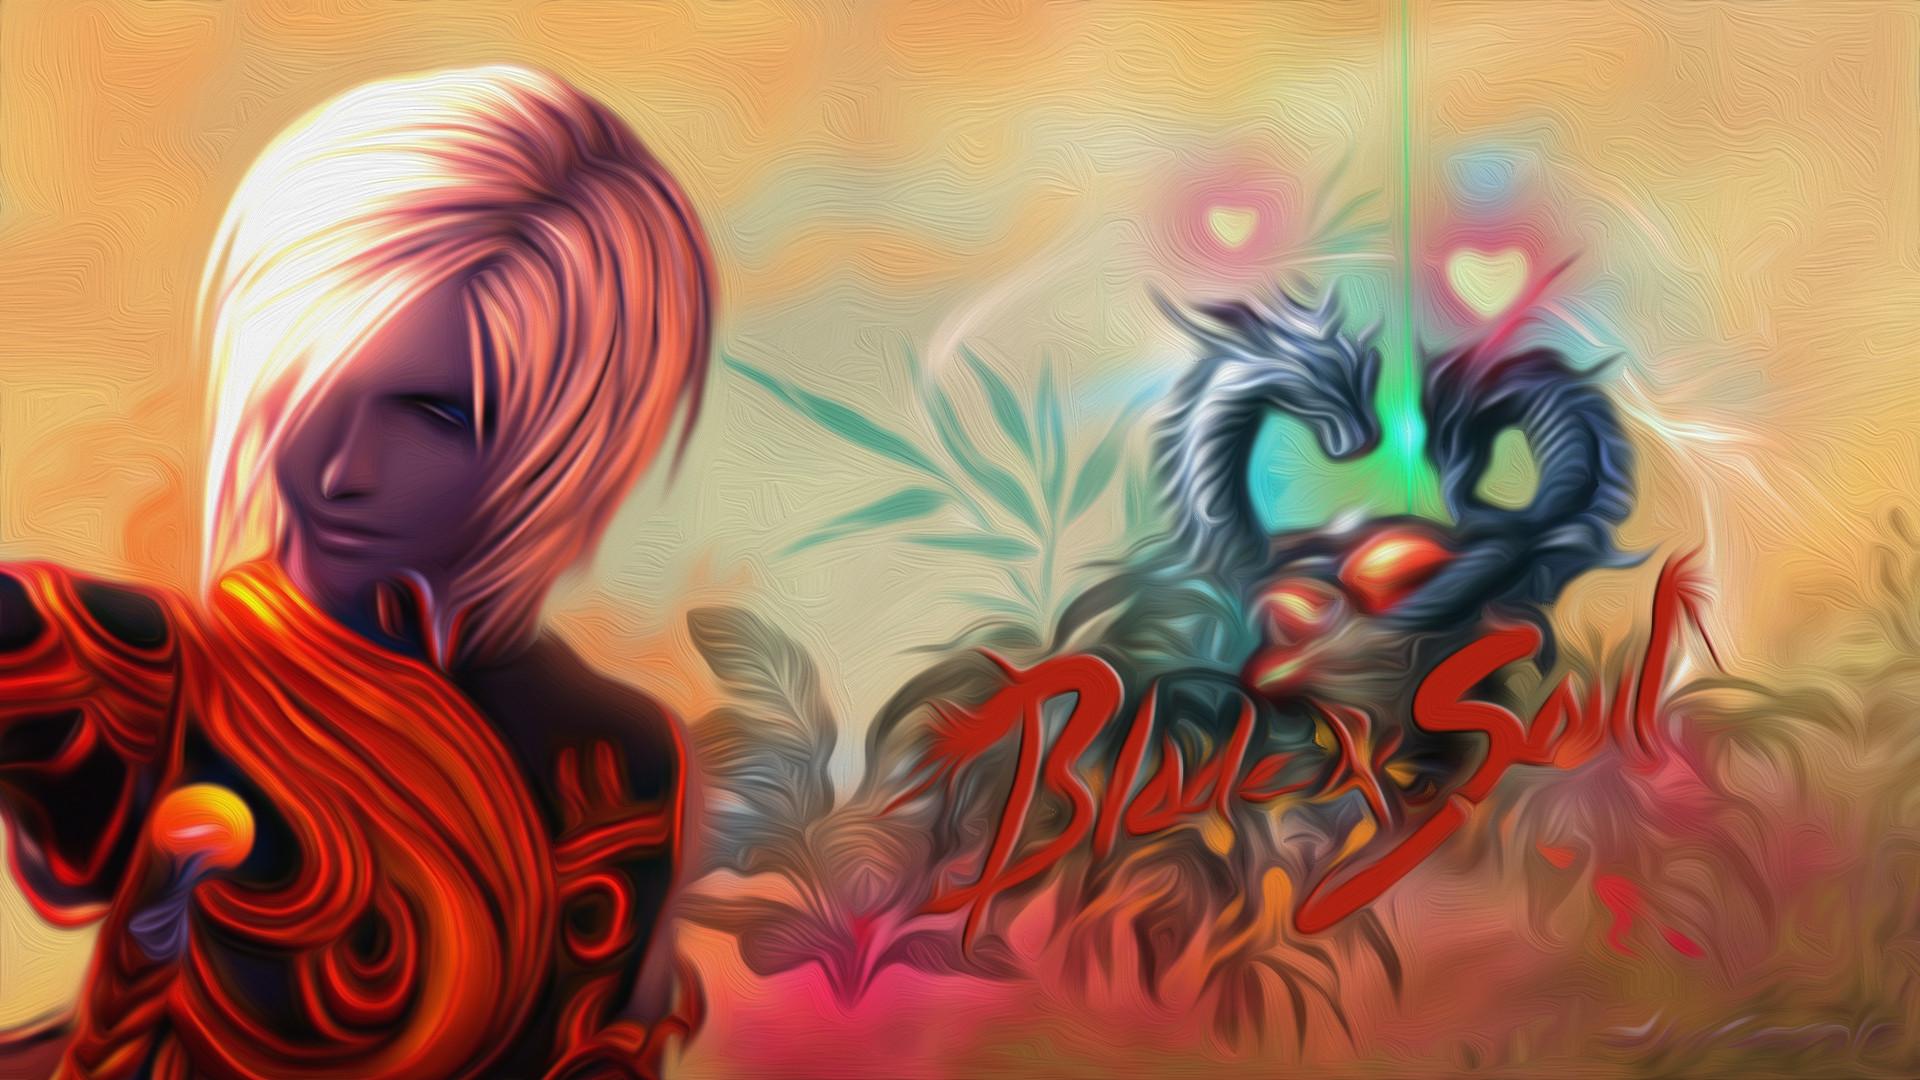 blade and soul_akaicz_2016_003_a